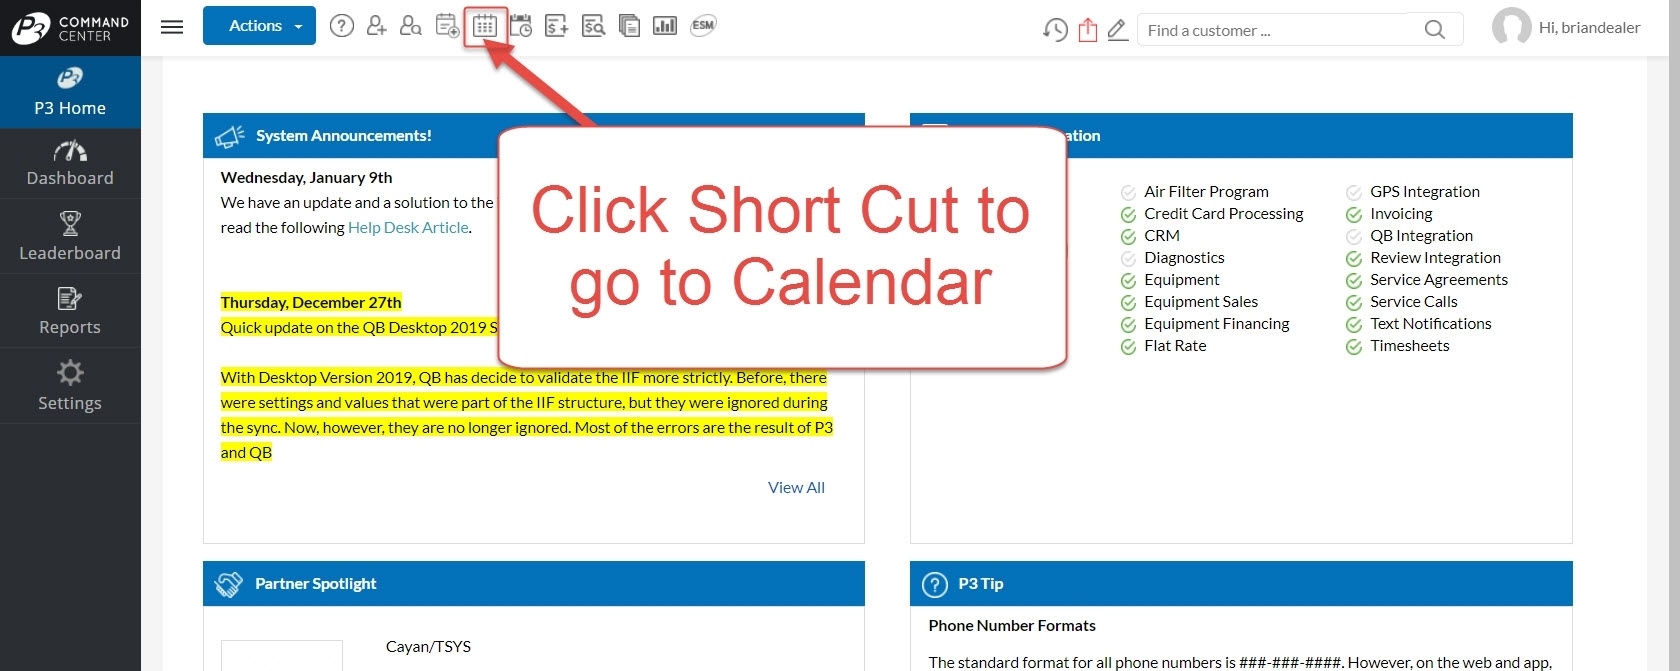 Create Service Call From Calendar – P3 Help Desk